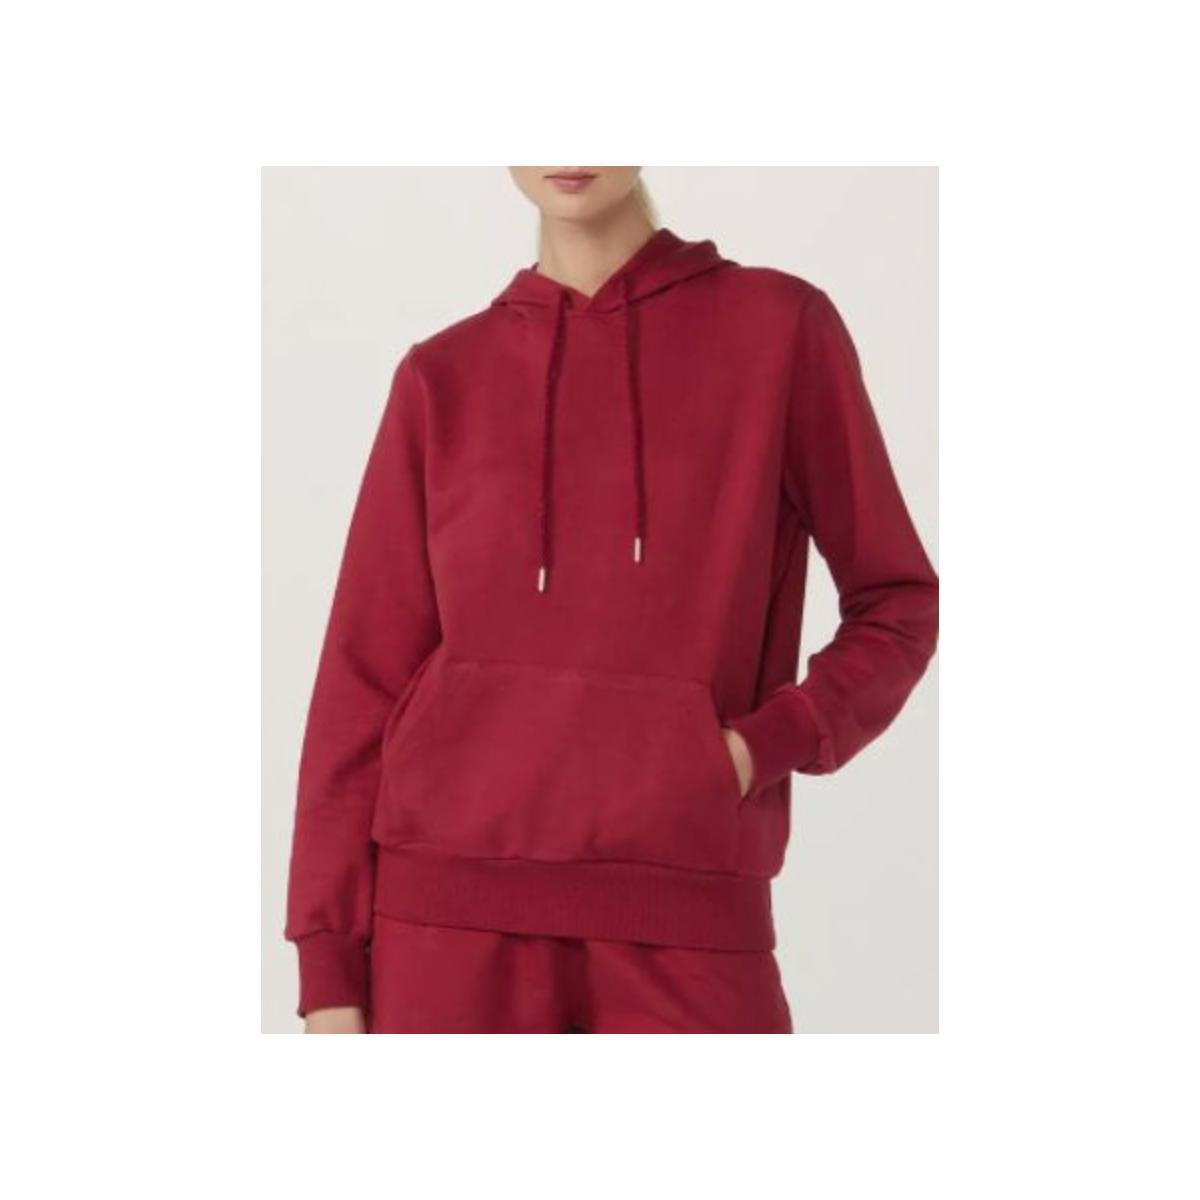 Blusão Feminino Hering 060n Rwwen Vermelho